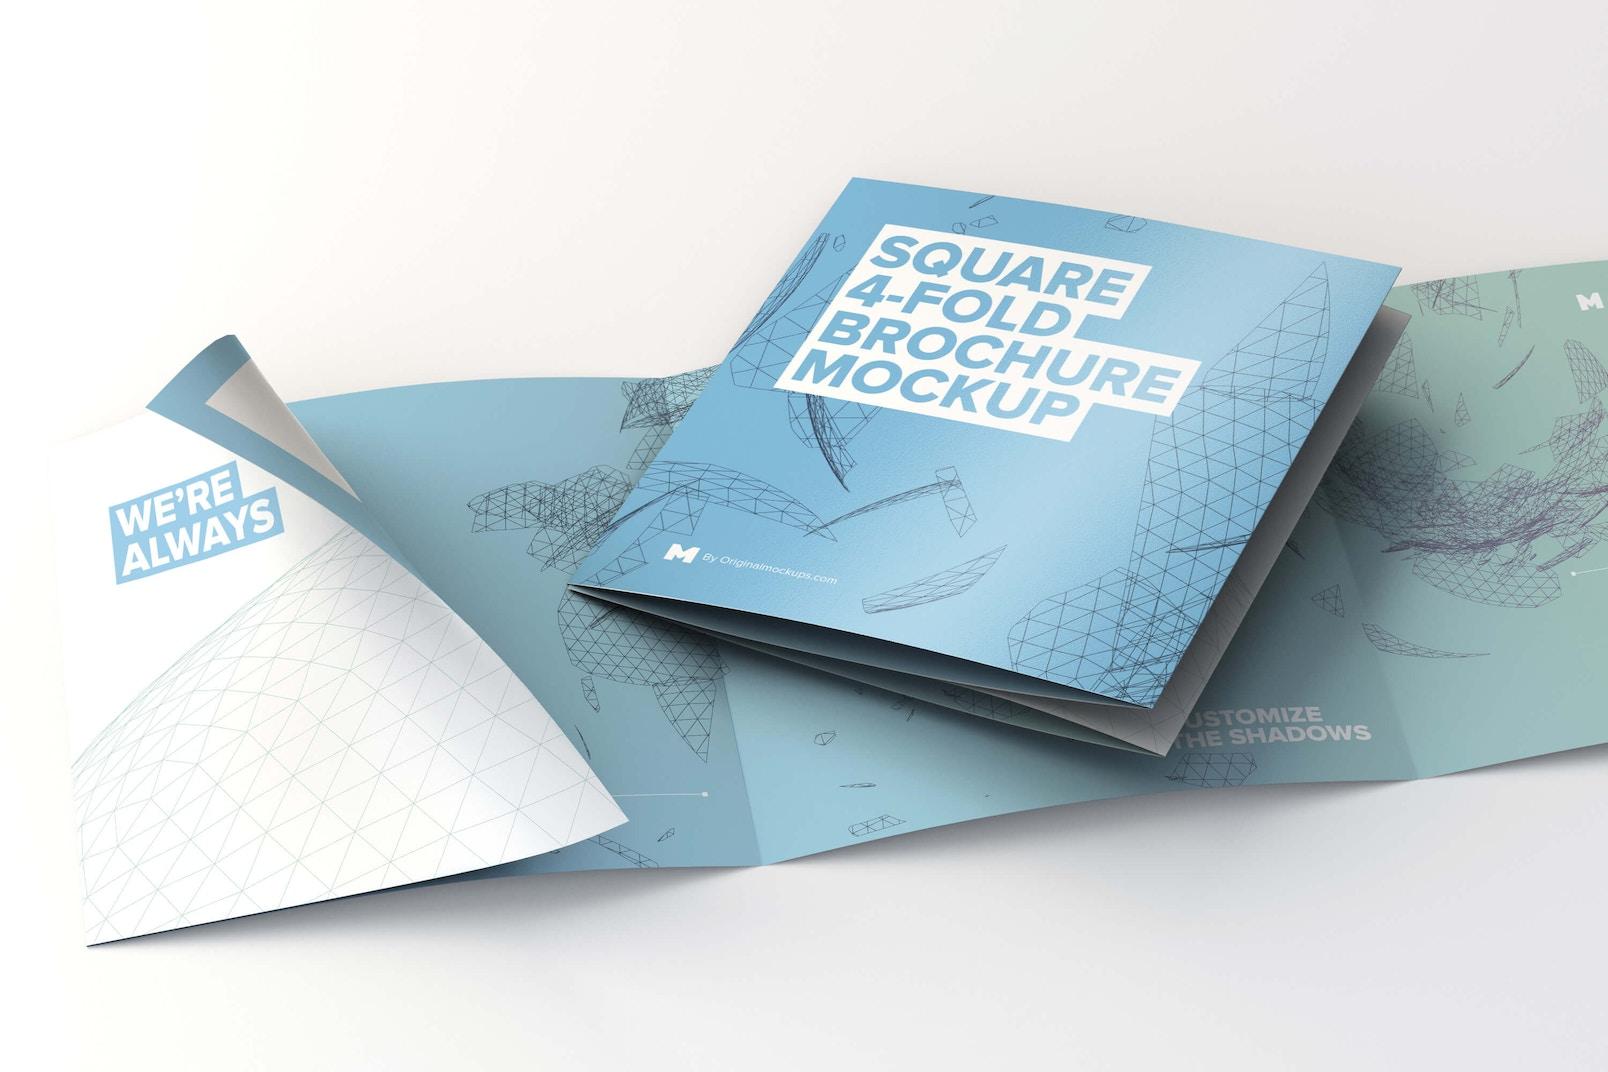 Folded and Unfolded Square 4-Fold-Brochure Mockup